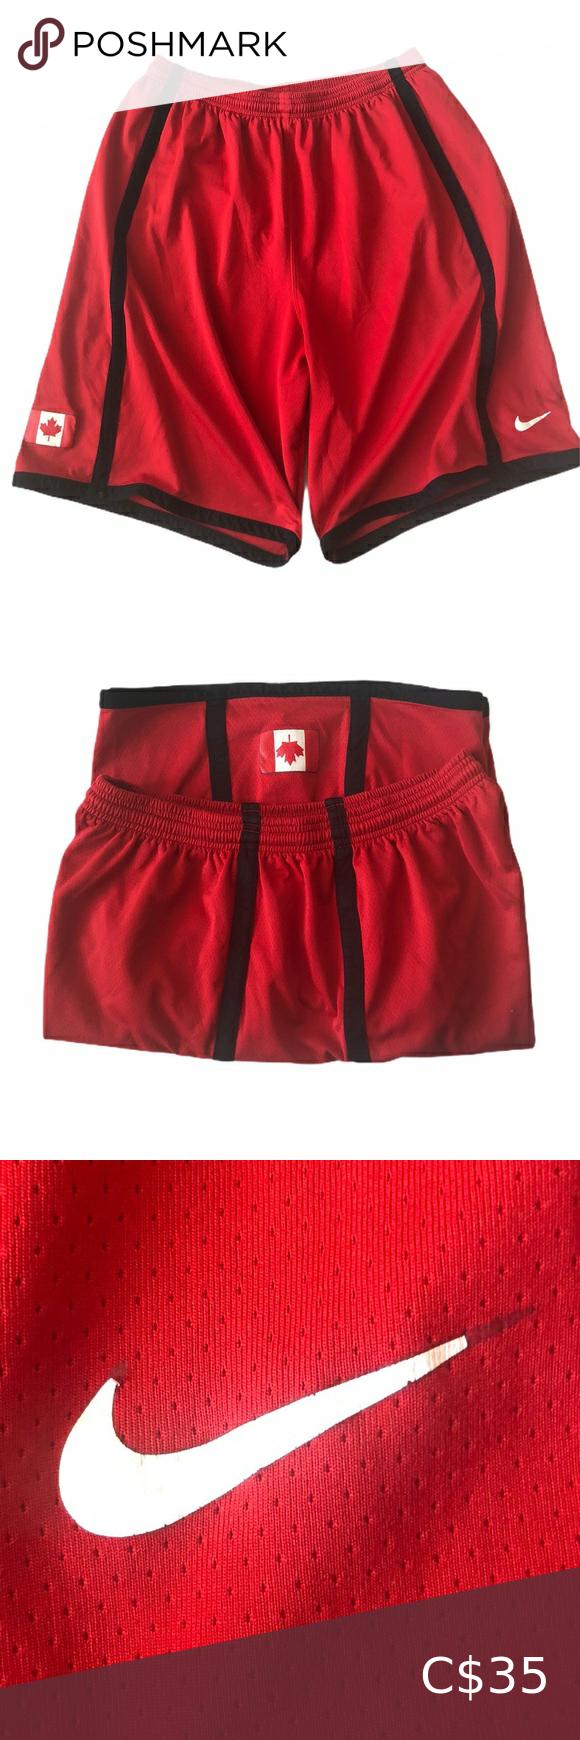 Nike Team Canada basketball shorts in 2020 Basketball